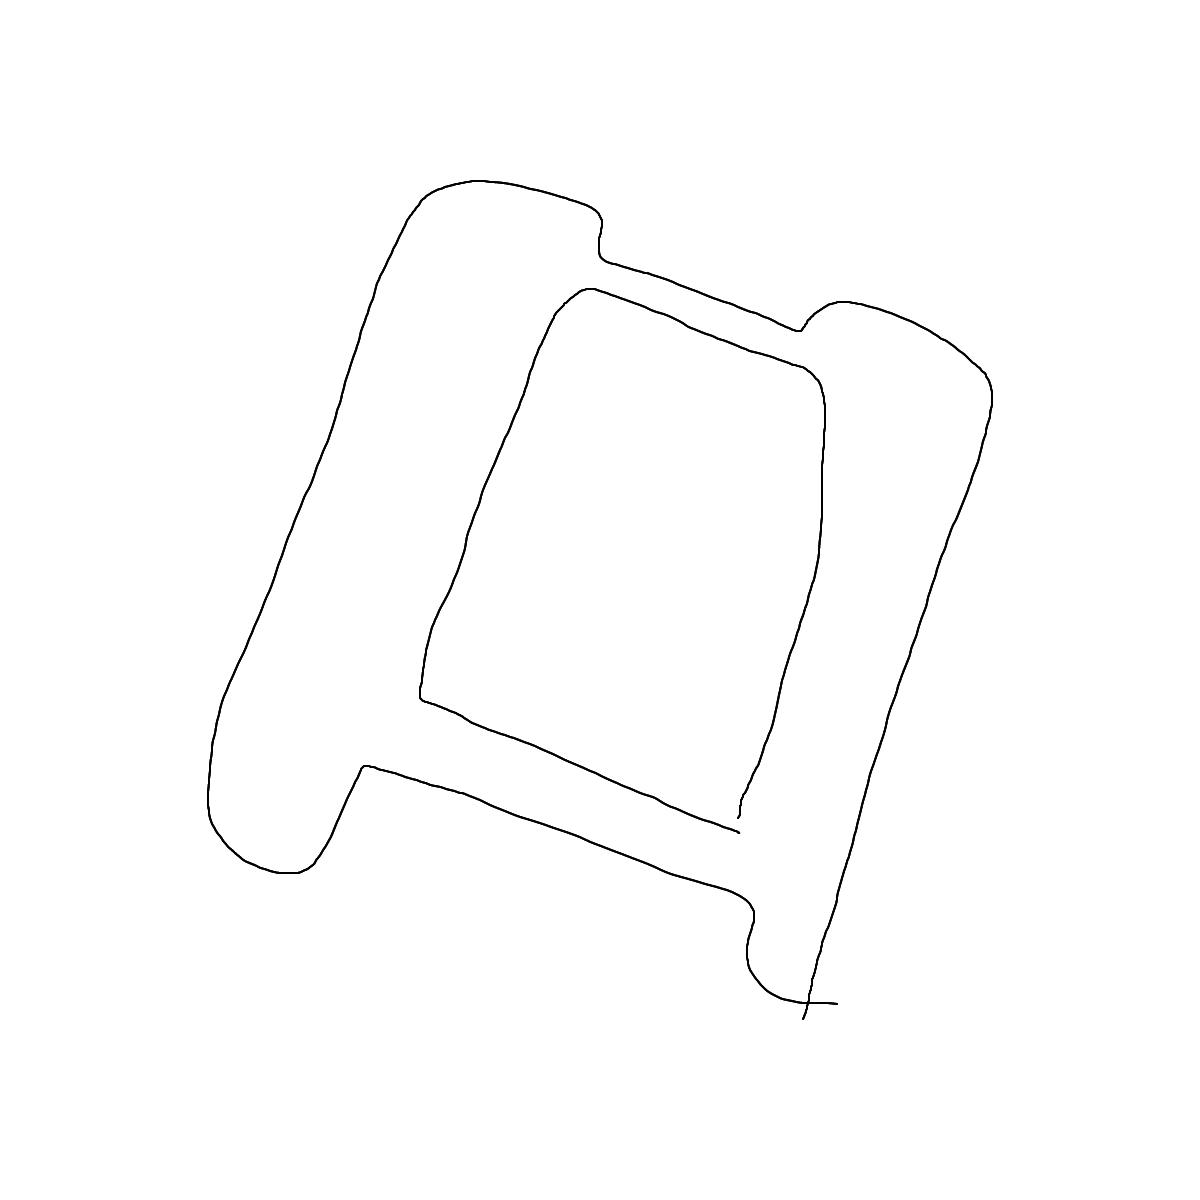 BAAAM drawing#23216 lat:35.6165046691894500lng: 139.5943145751953000